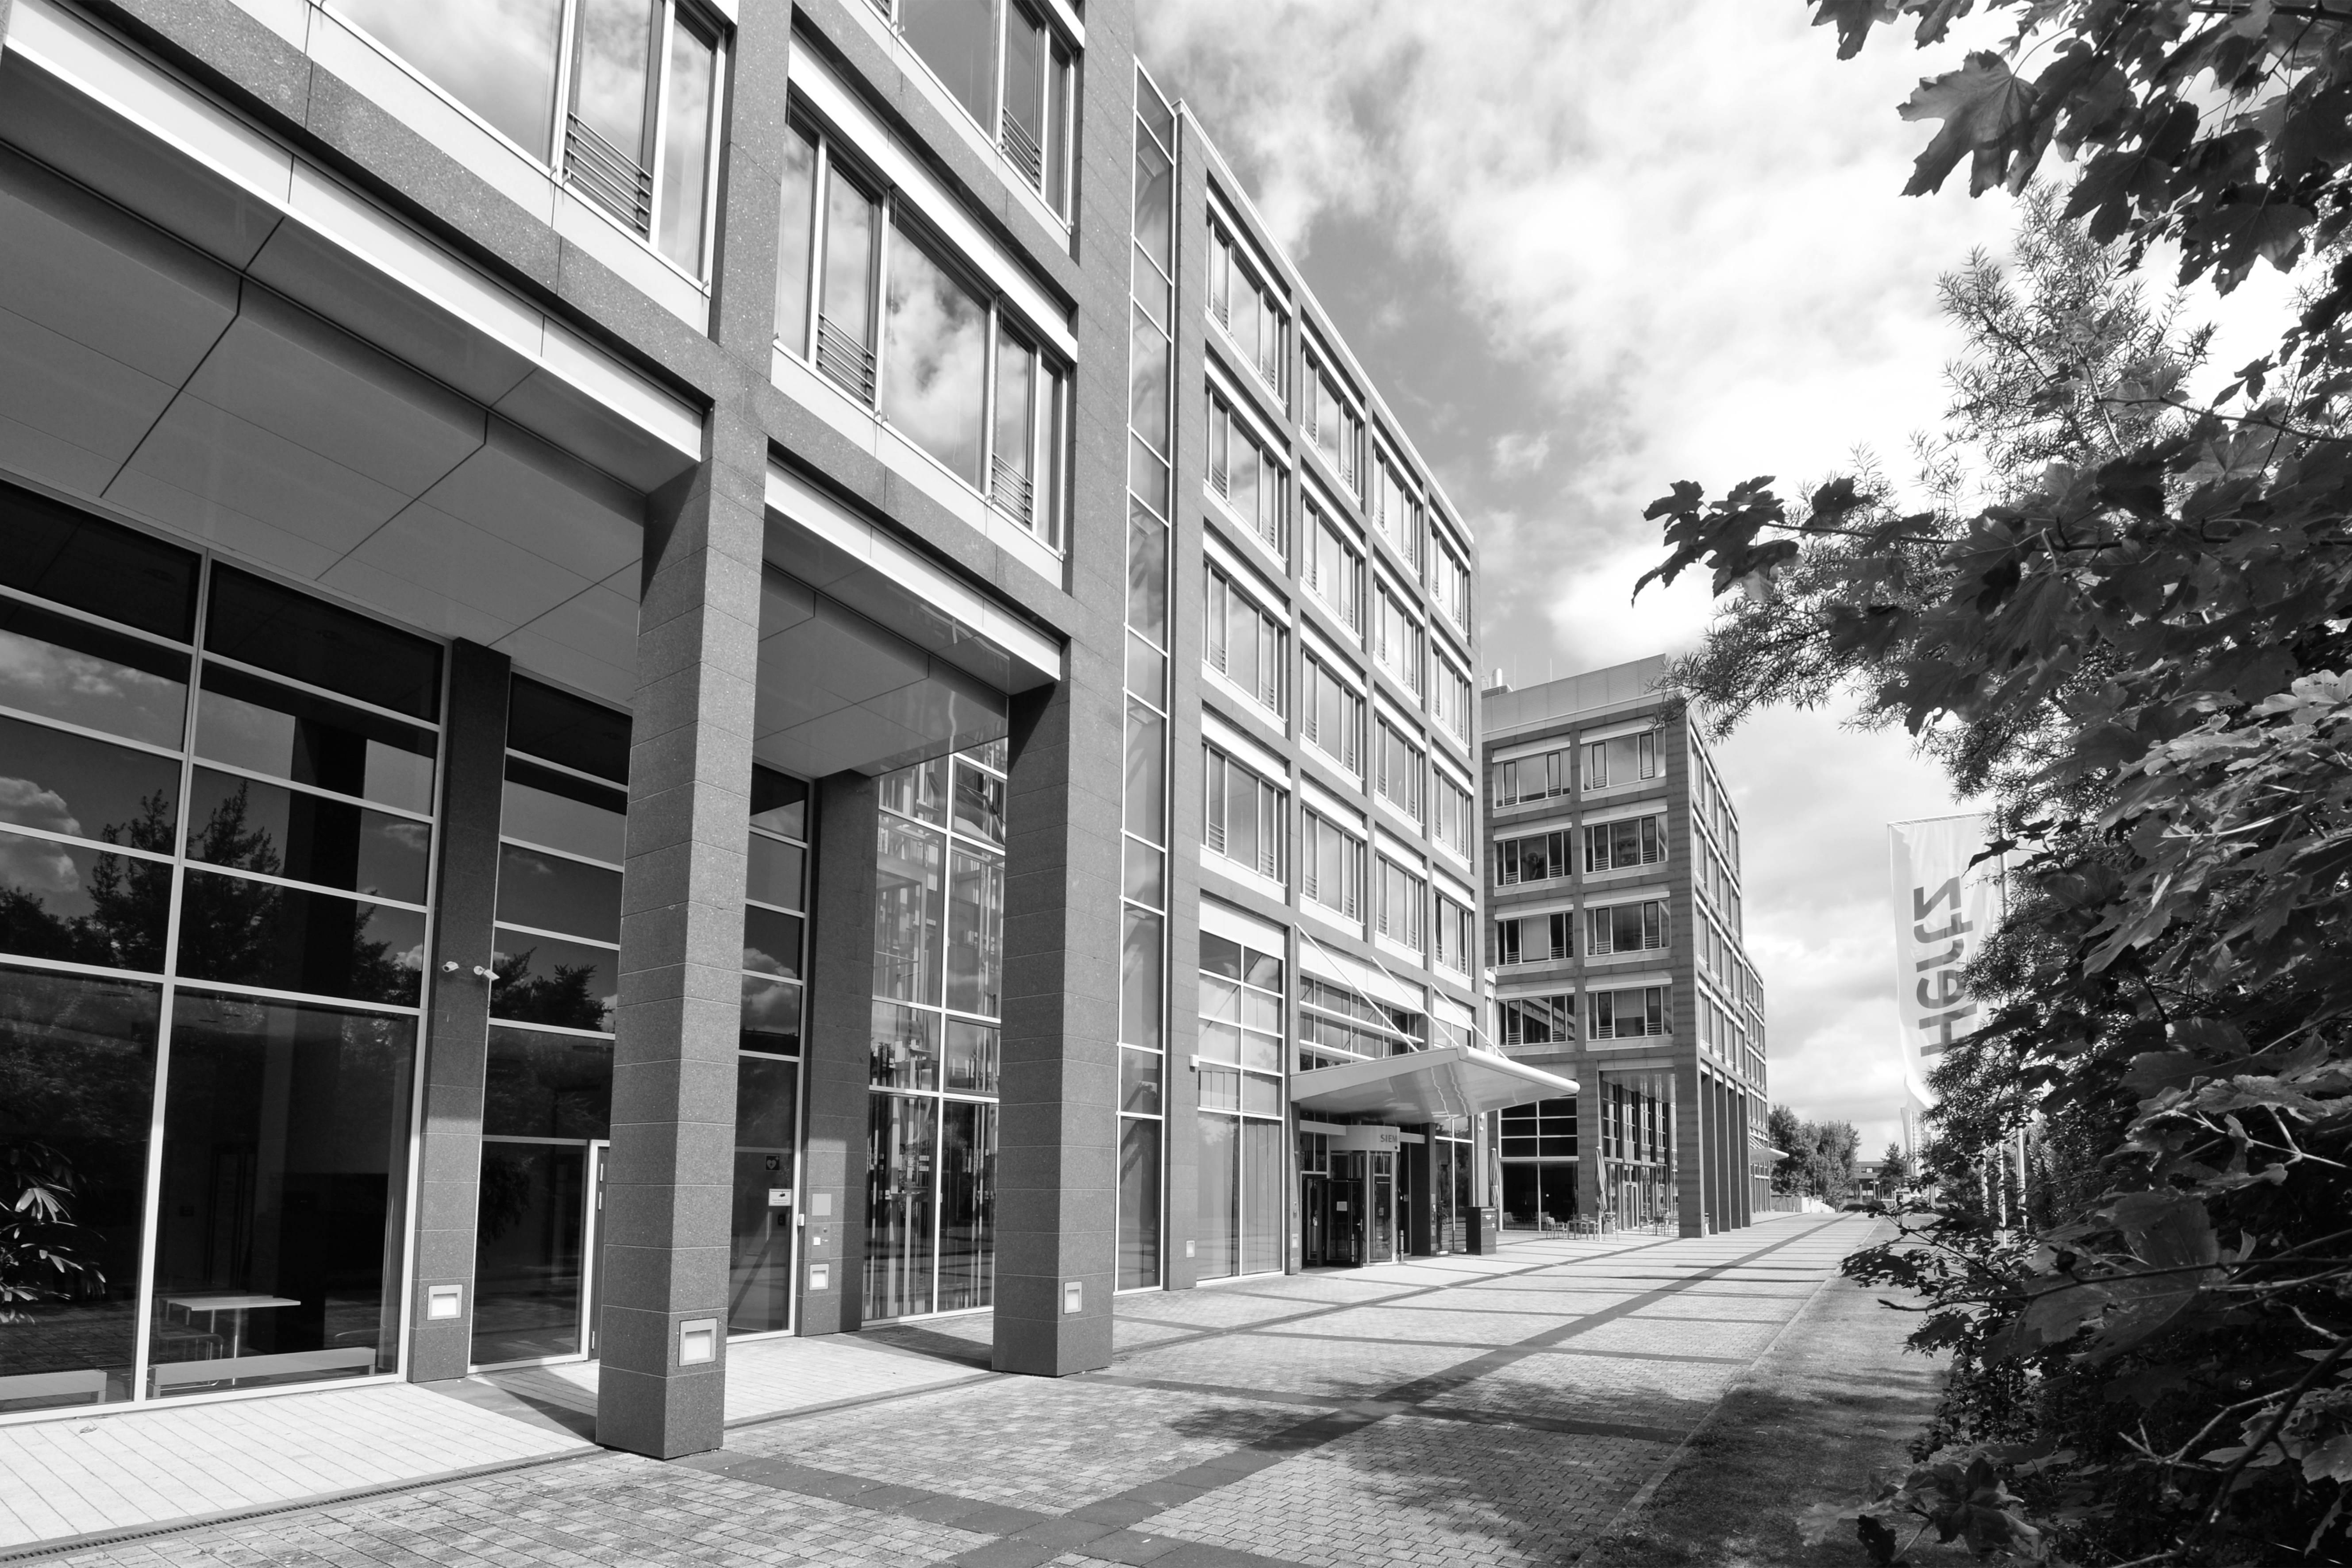 Lianeo stärkt Profil als erfolgreicher Vermieter: Verlängerung eines Mietvertrags über 2.500 Quadratmeter im Großraum Frankfurt unterzeichnet / Lianeo strengthens profile as successful leasing company: Extension of a lease for 2,500 square metres signed in the greater Frankfurt area